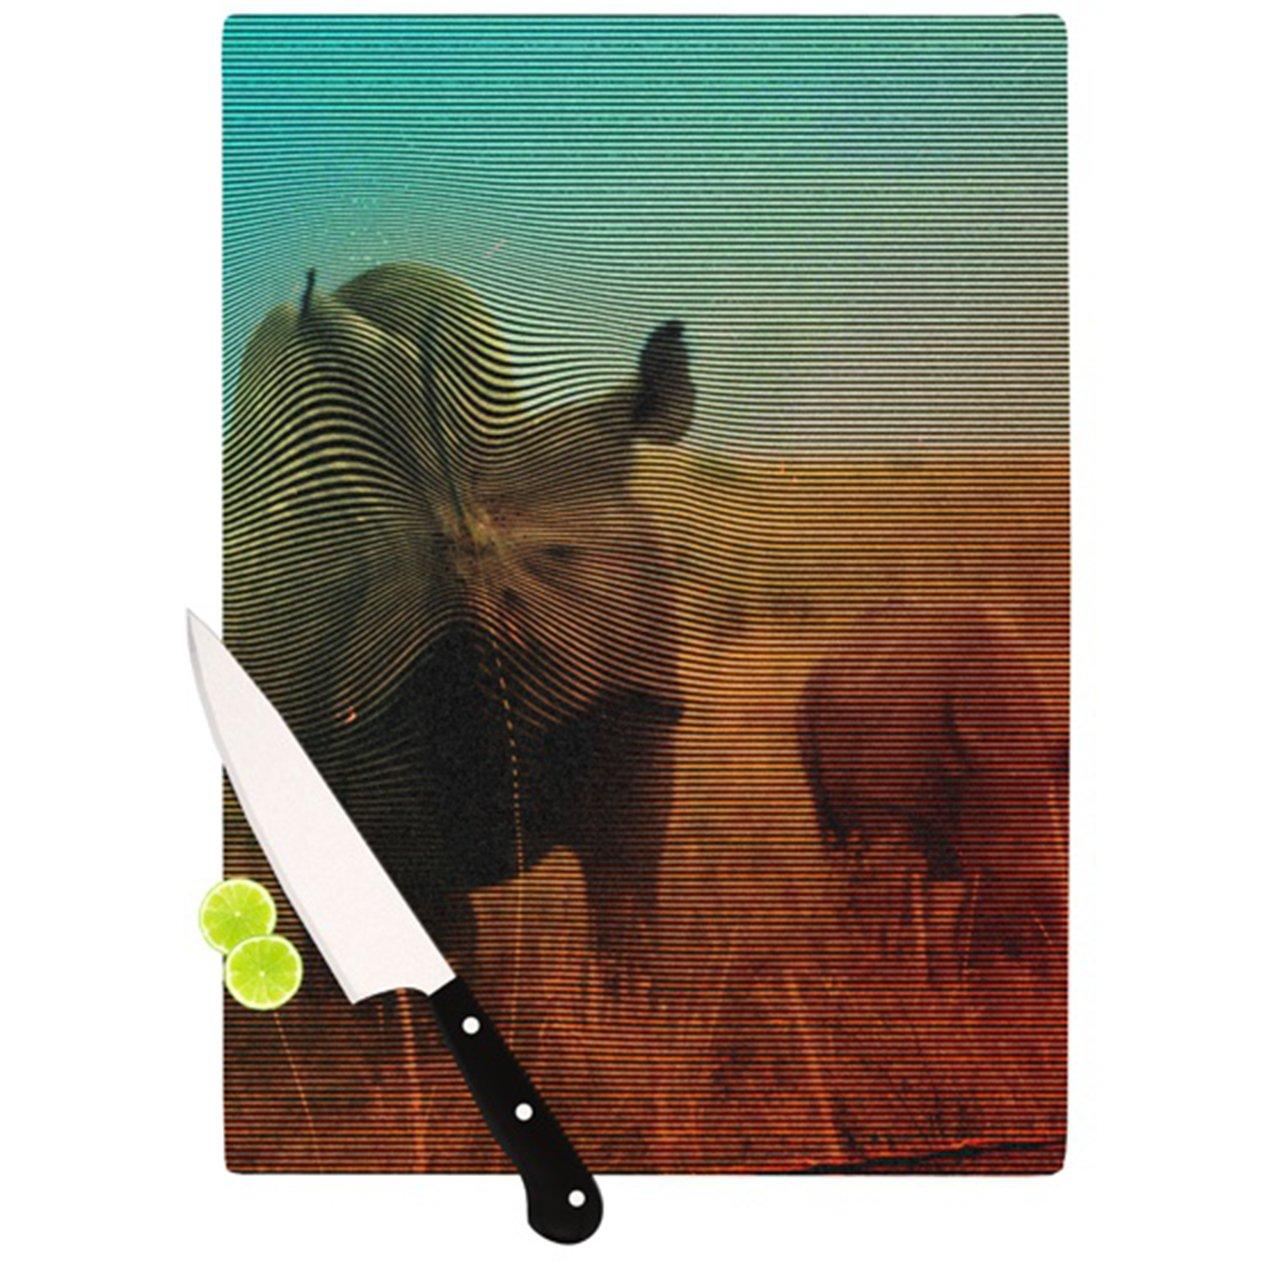 11.5 by 8.25-Inch Kess InHouse Danny Ivan Abstract Rhino Cutting Board